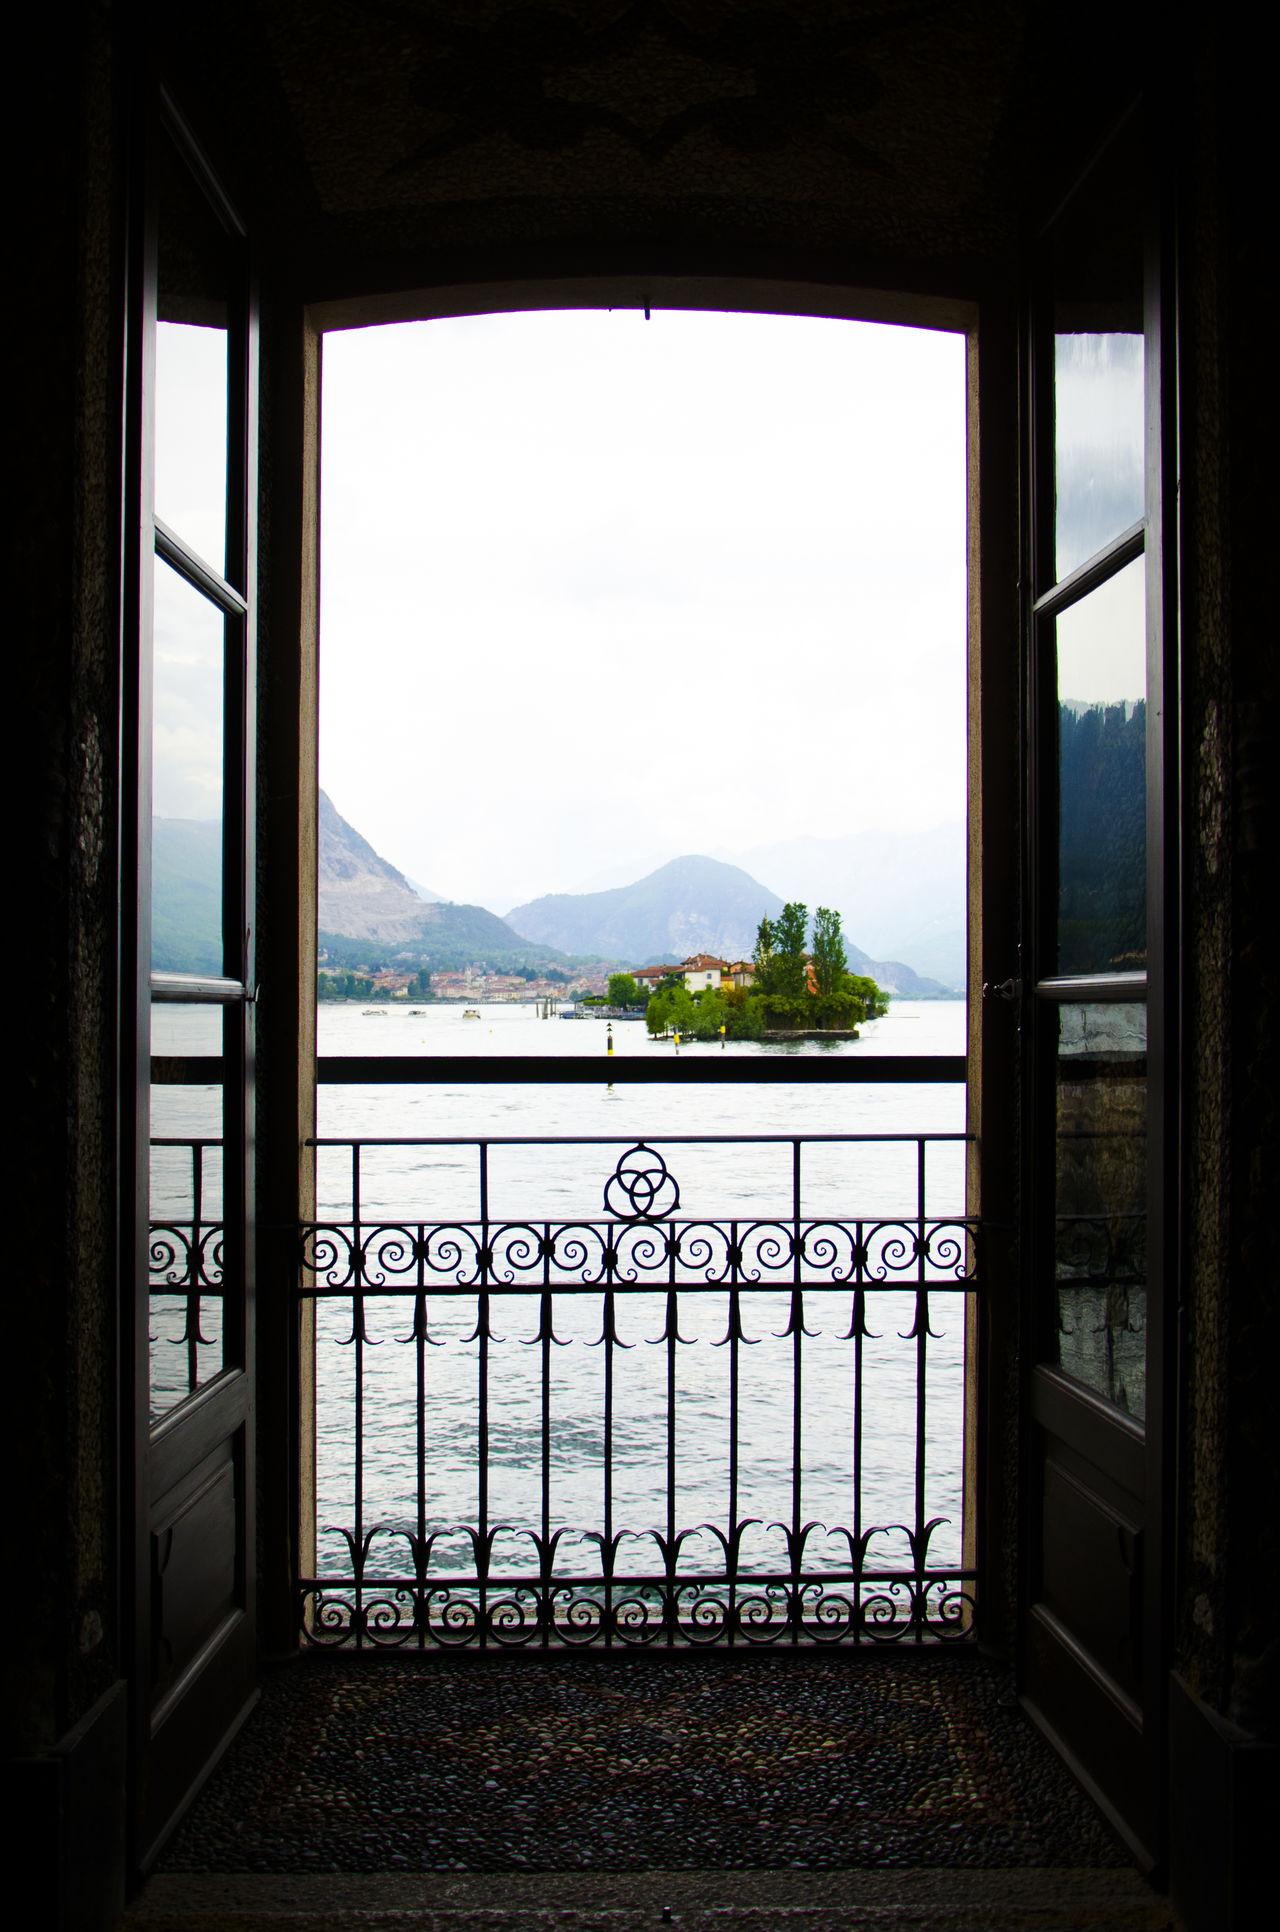 Finestra Island Isola Lago Maggiore Lago Maggiore, Italy Lake Lake View Palace Palazzo Silhouette View Vista Window The Architect - 2017 EyeEm Awards